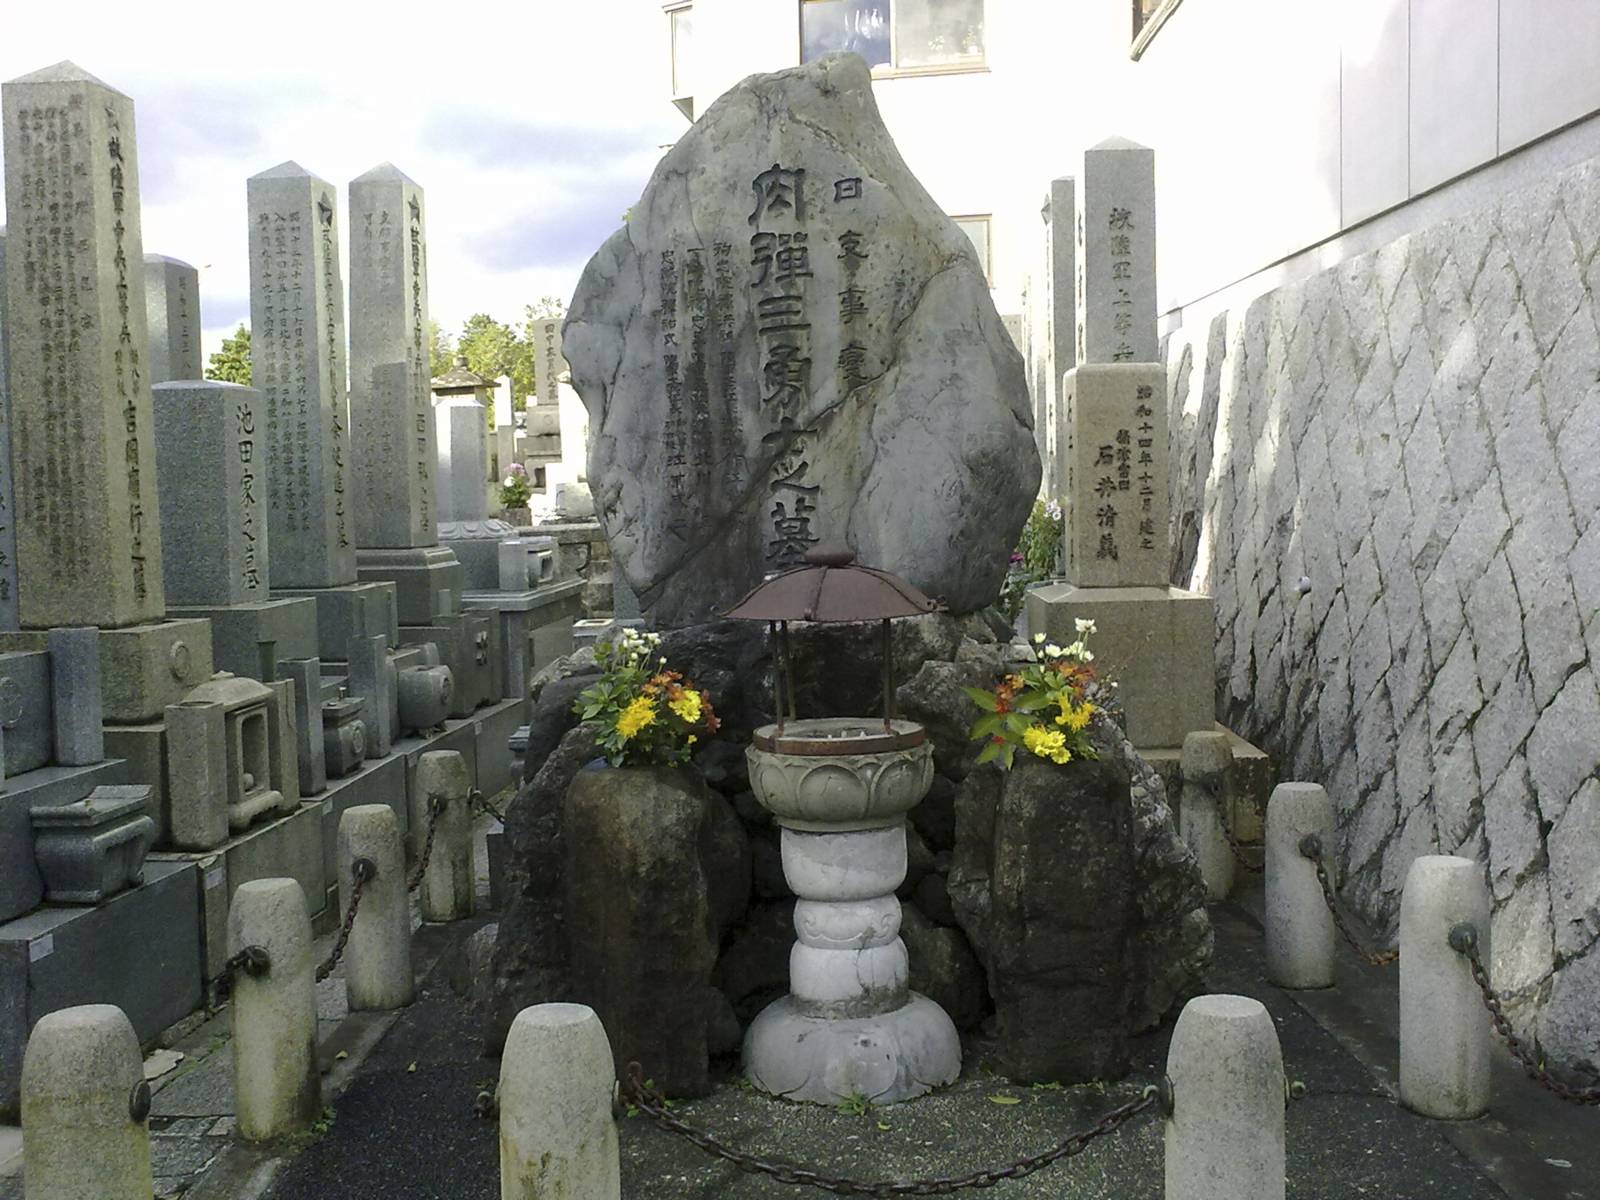 Giappone-japan-kyoto-cemetery-pietra-funeraria